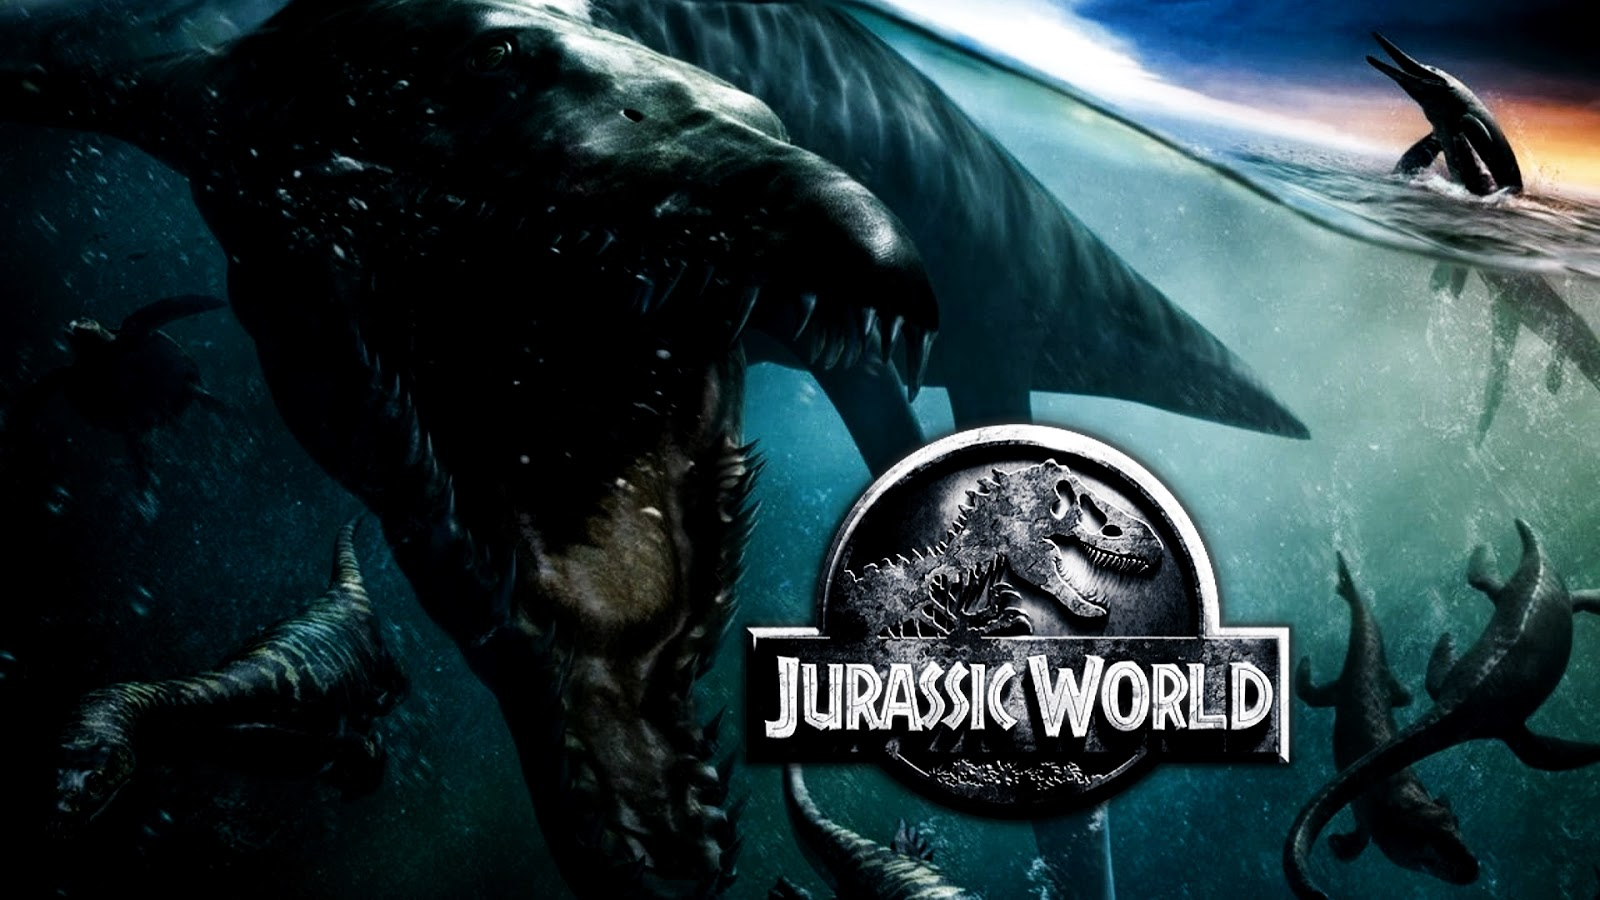 Jurassic World 2015 Niazimovies Blogspot Com Watch Online Full Movie Free Download Dual Audio Hdrip 720p Hc Korsubs Mp4 Movies